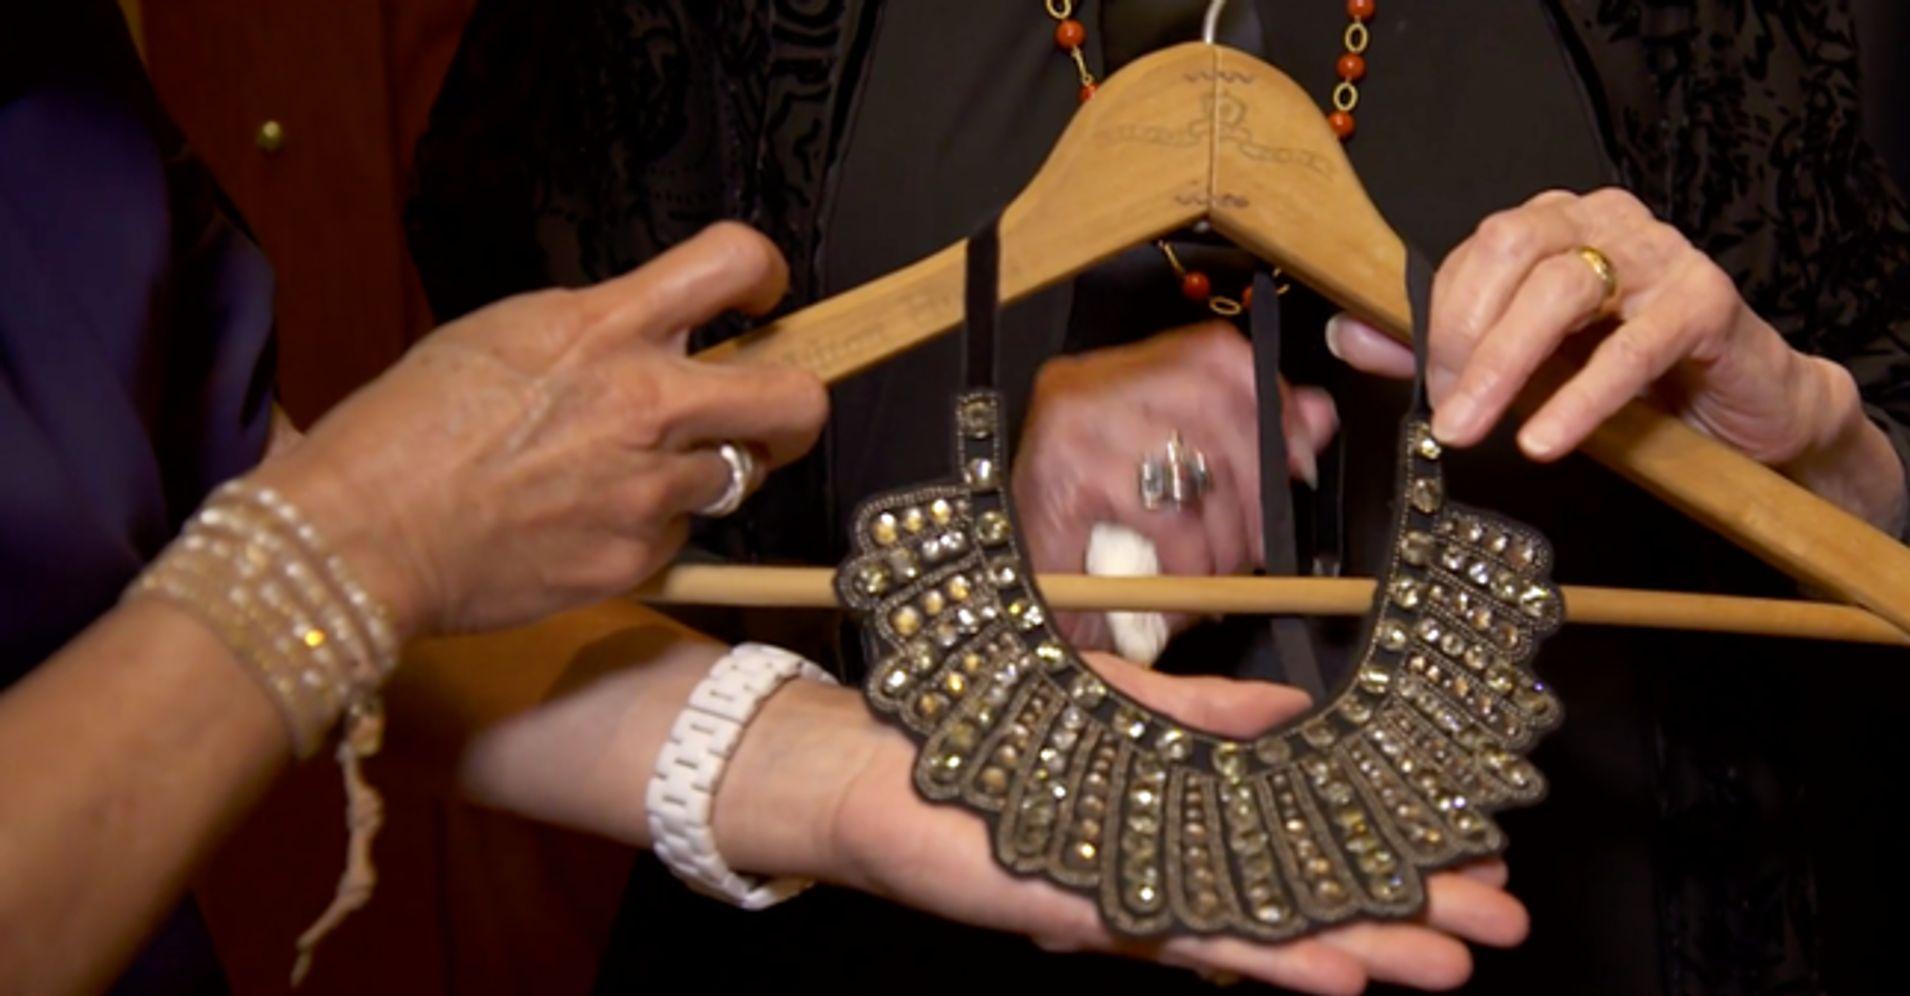 262d2562d Ruth Bader Ginsburg's 'Dissent Collar' Is Back At Banana Republic |  HuffPost Life